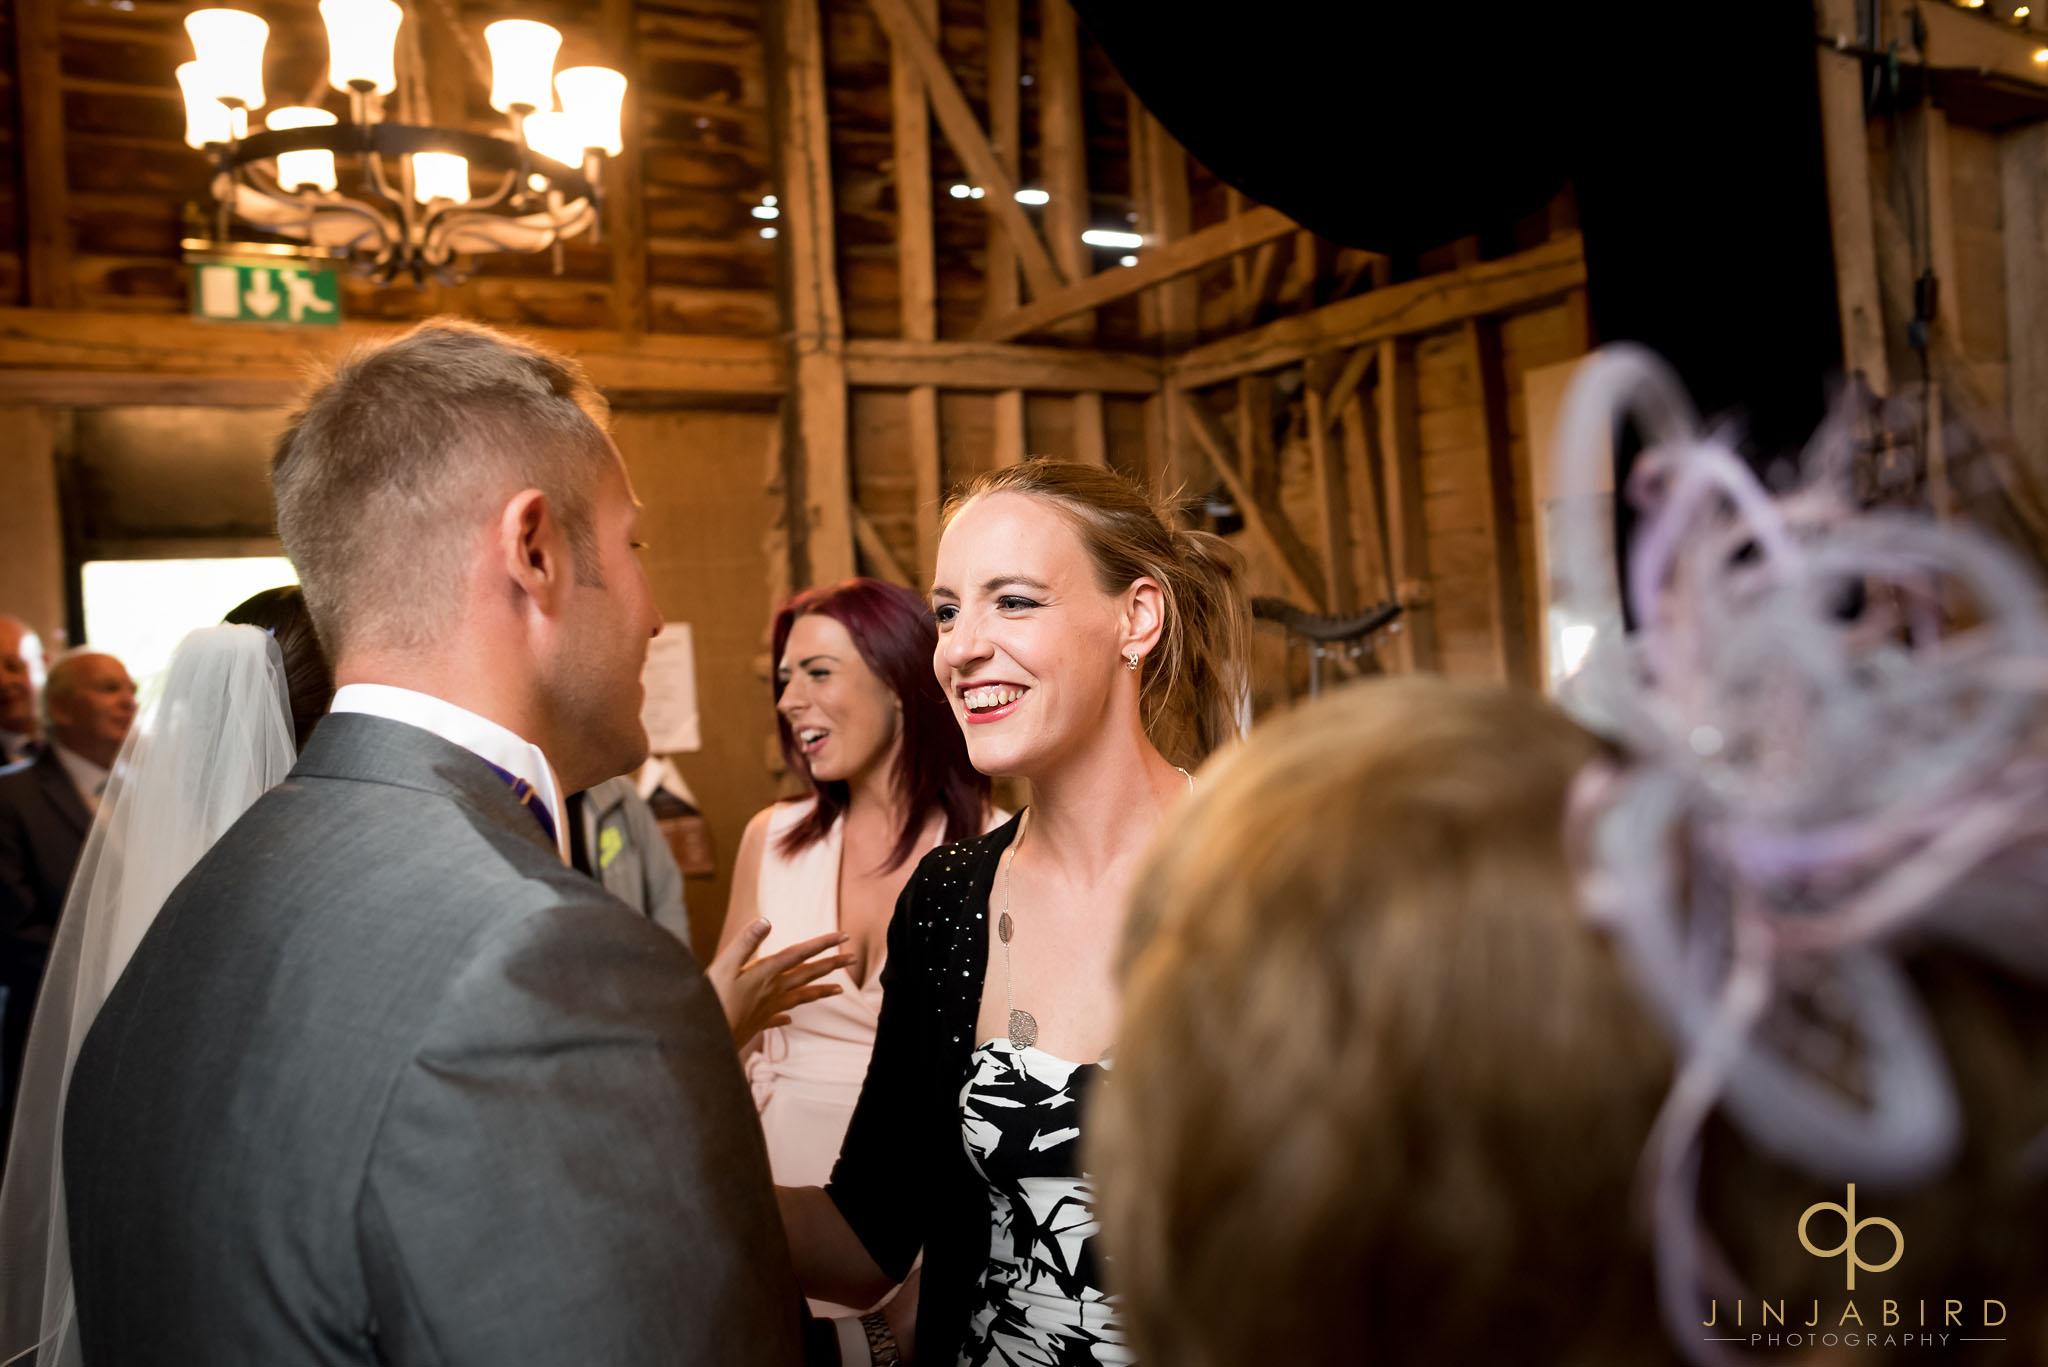 weddings childerley hall long barn